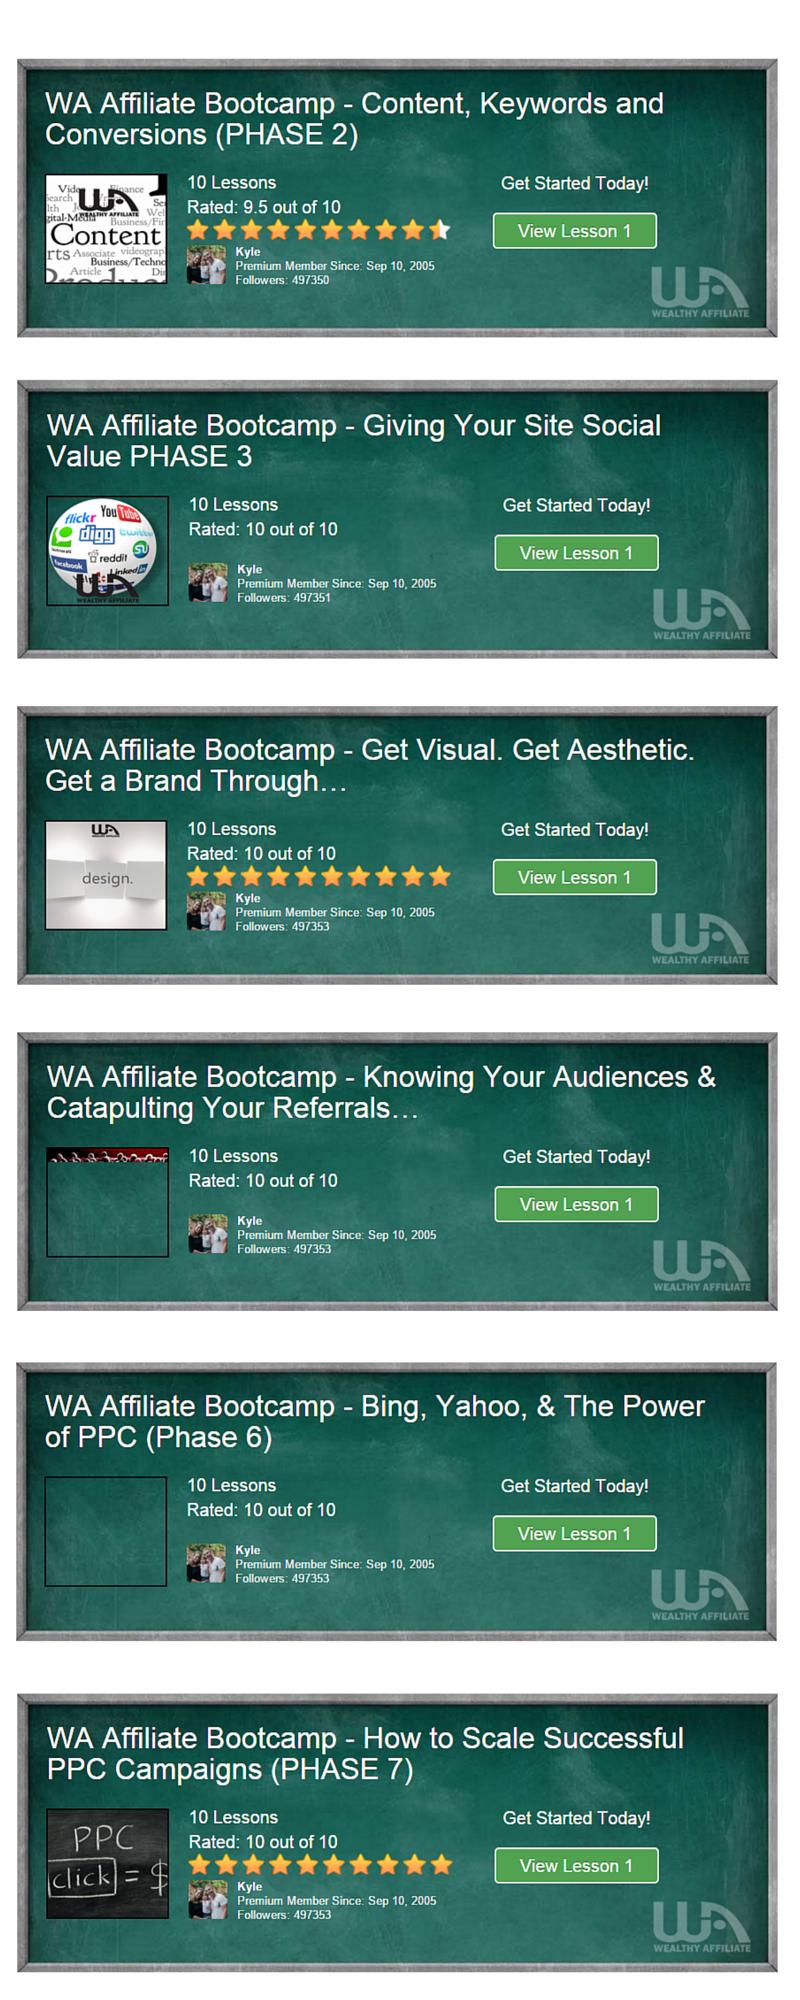 Premium WA affiliate Bootcamp